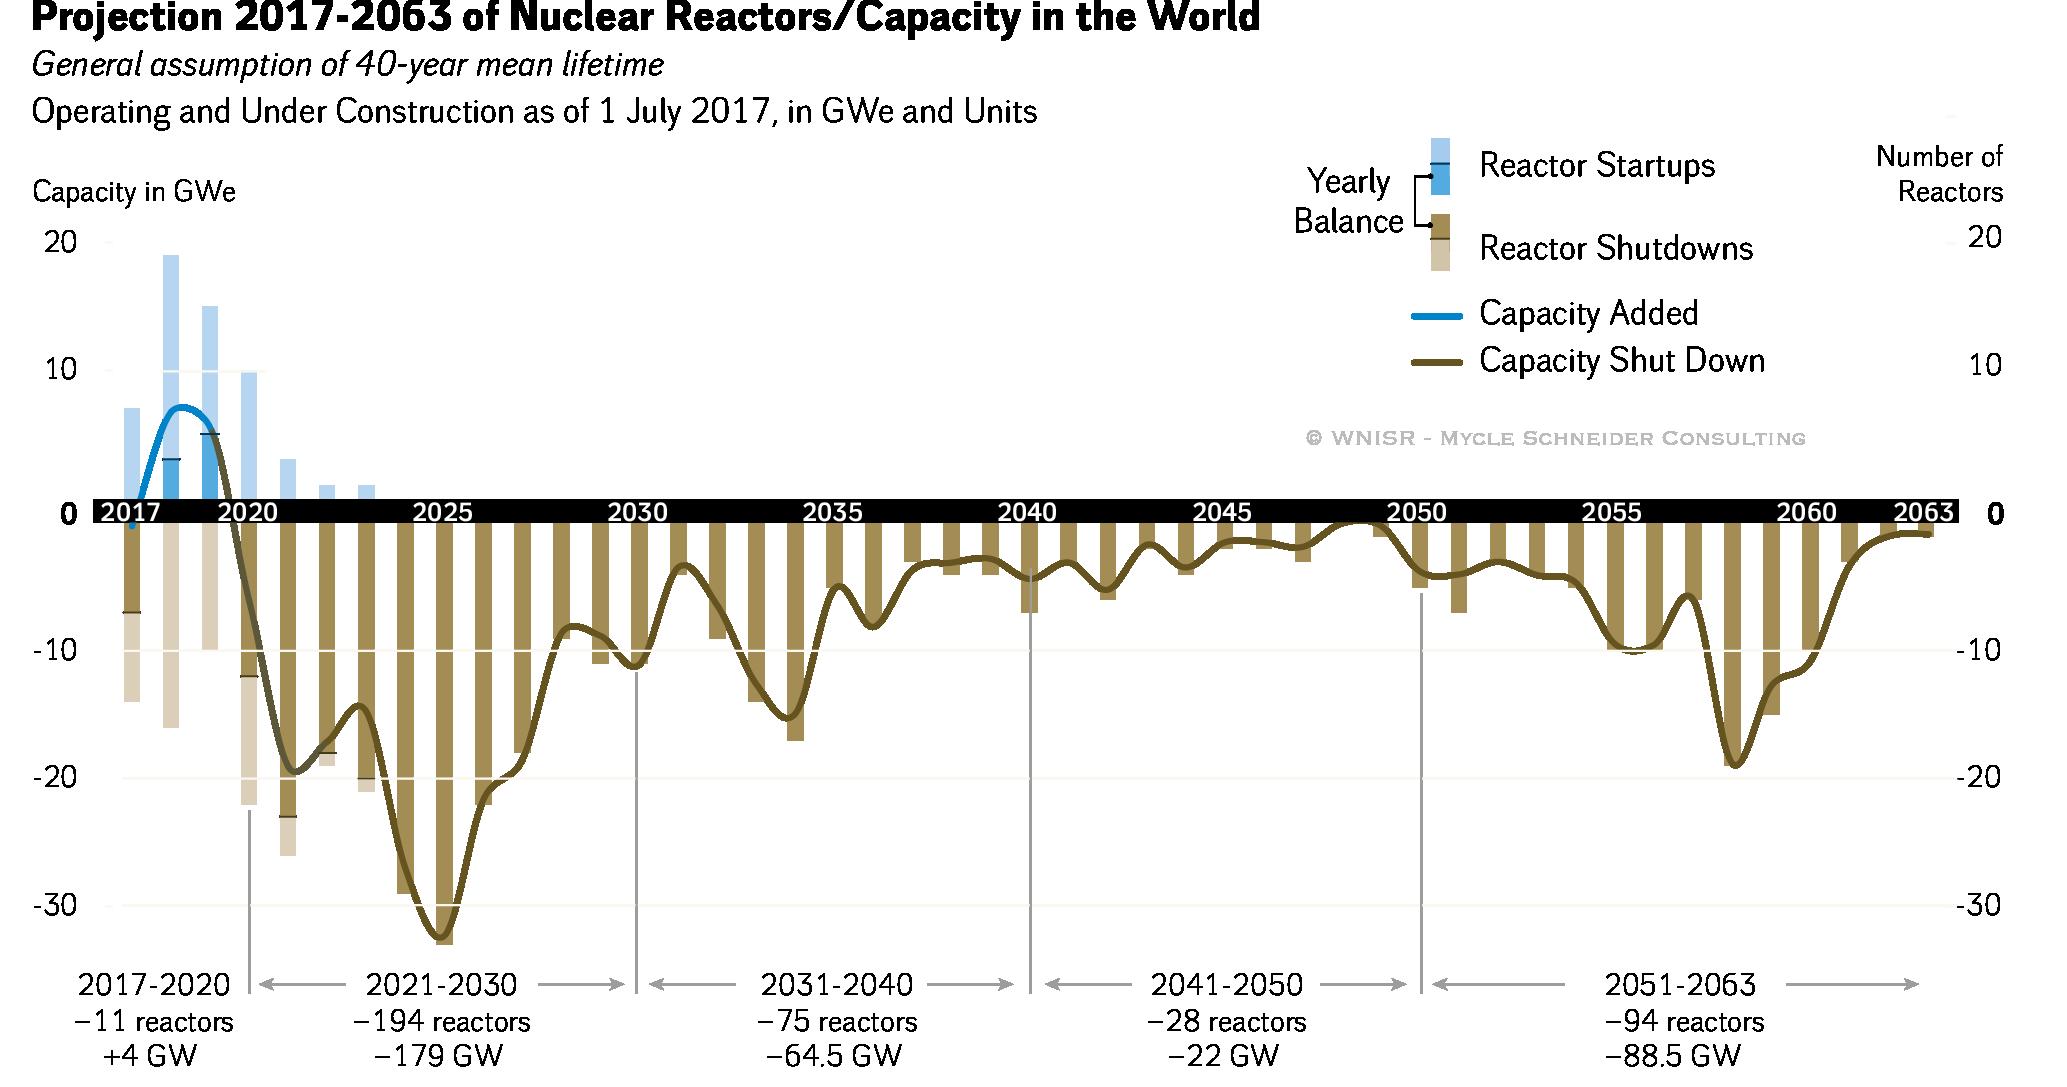 uae central bank circulars 156 2021